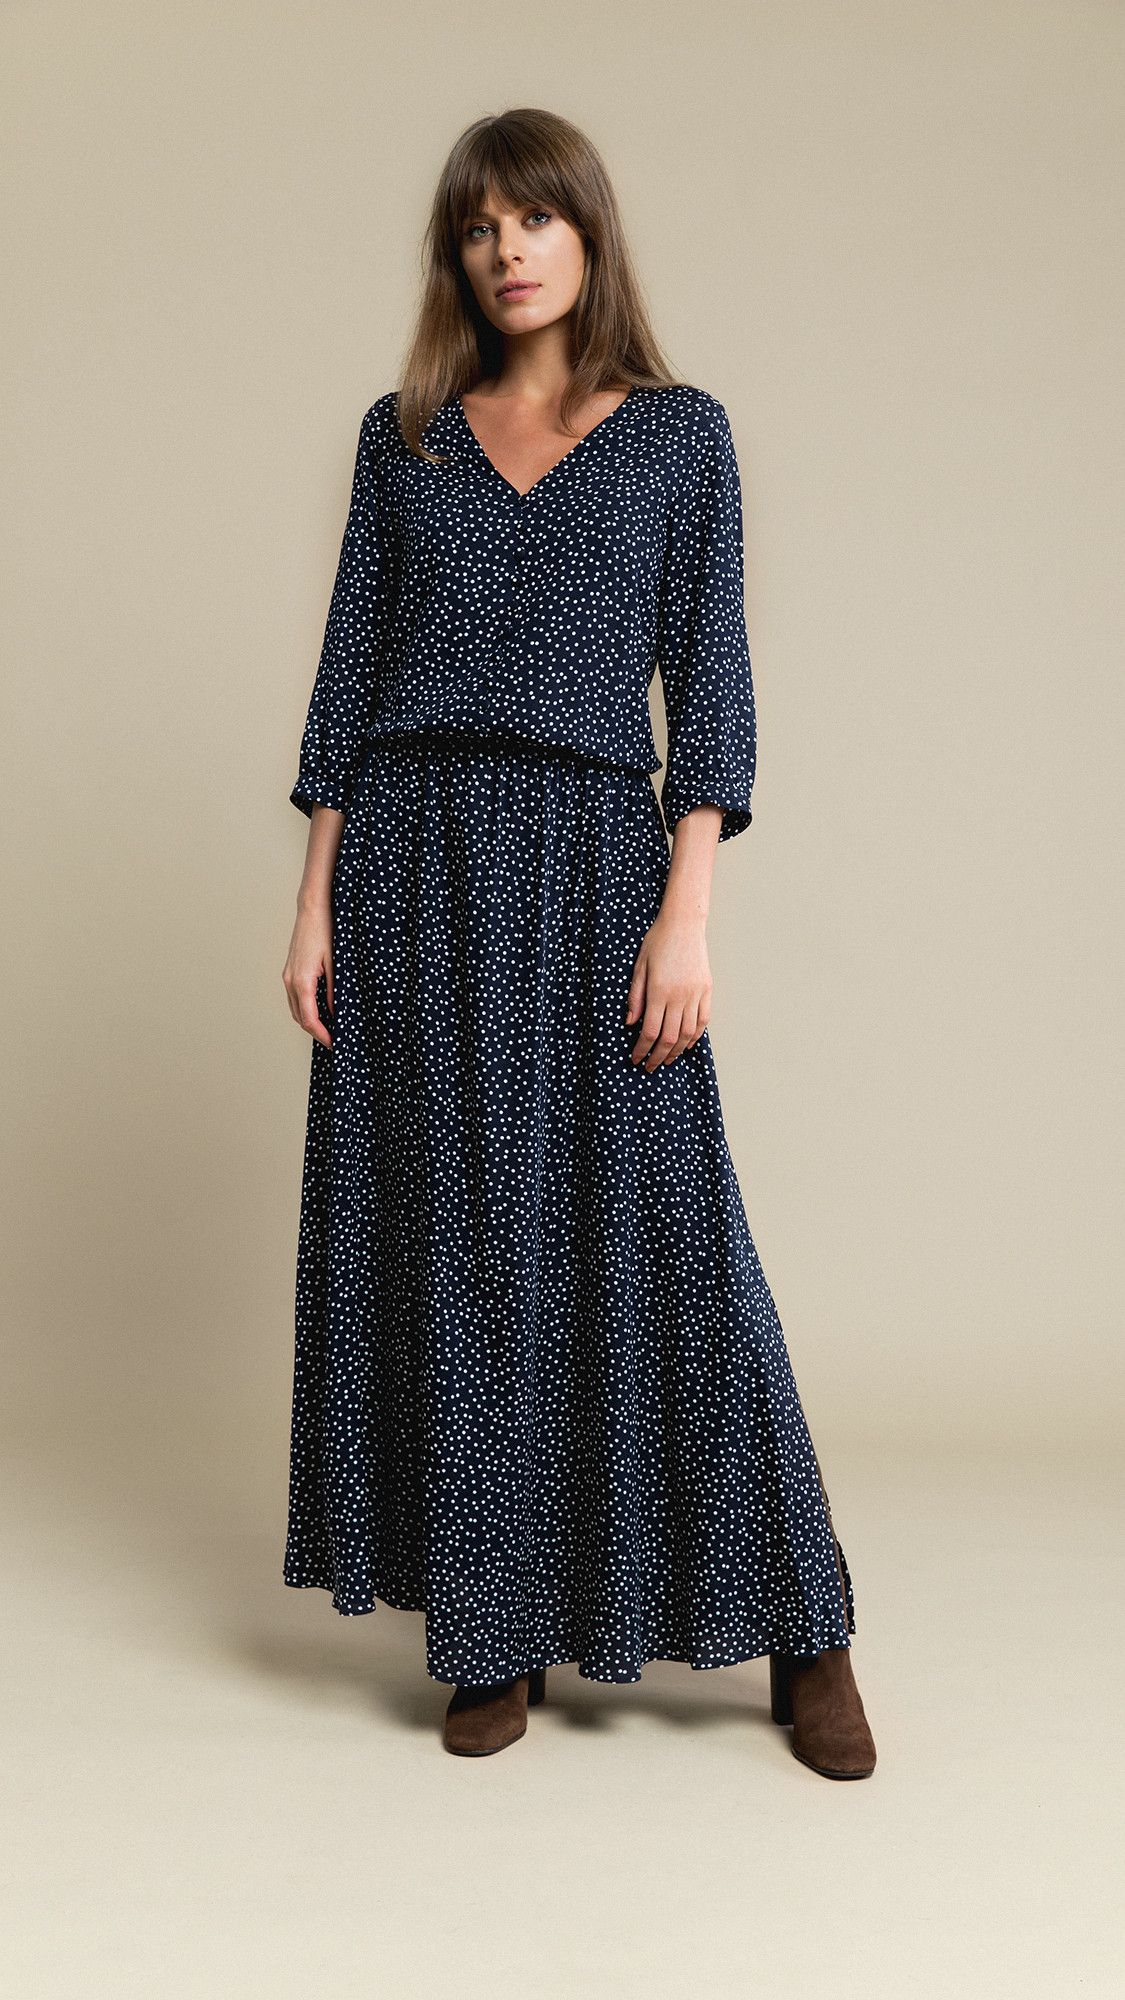 Dress Lana Dotted Navy